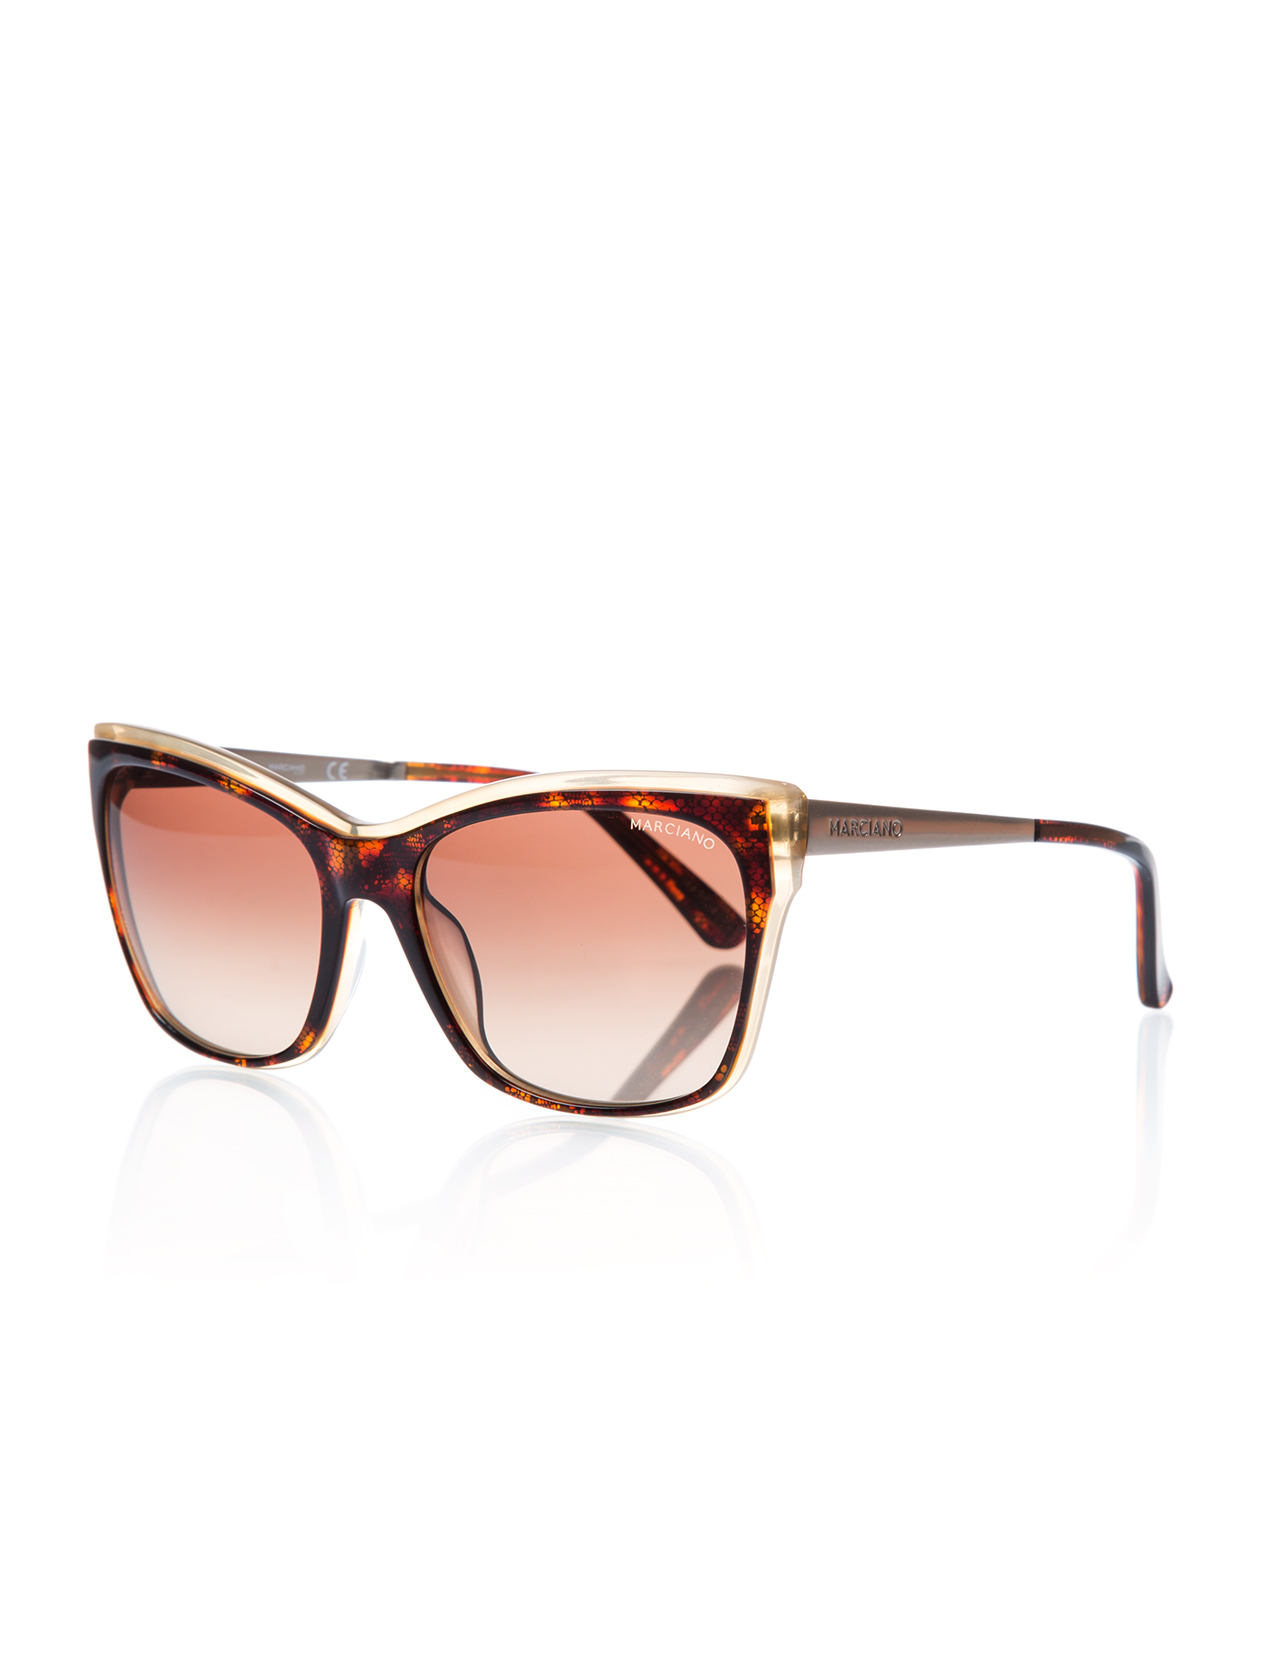 Women's sunglasses gu 0739 50f bone Brown organic 57-guess